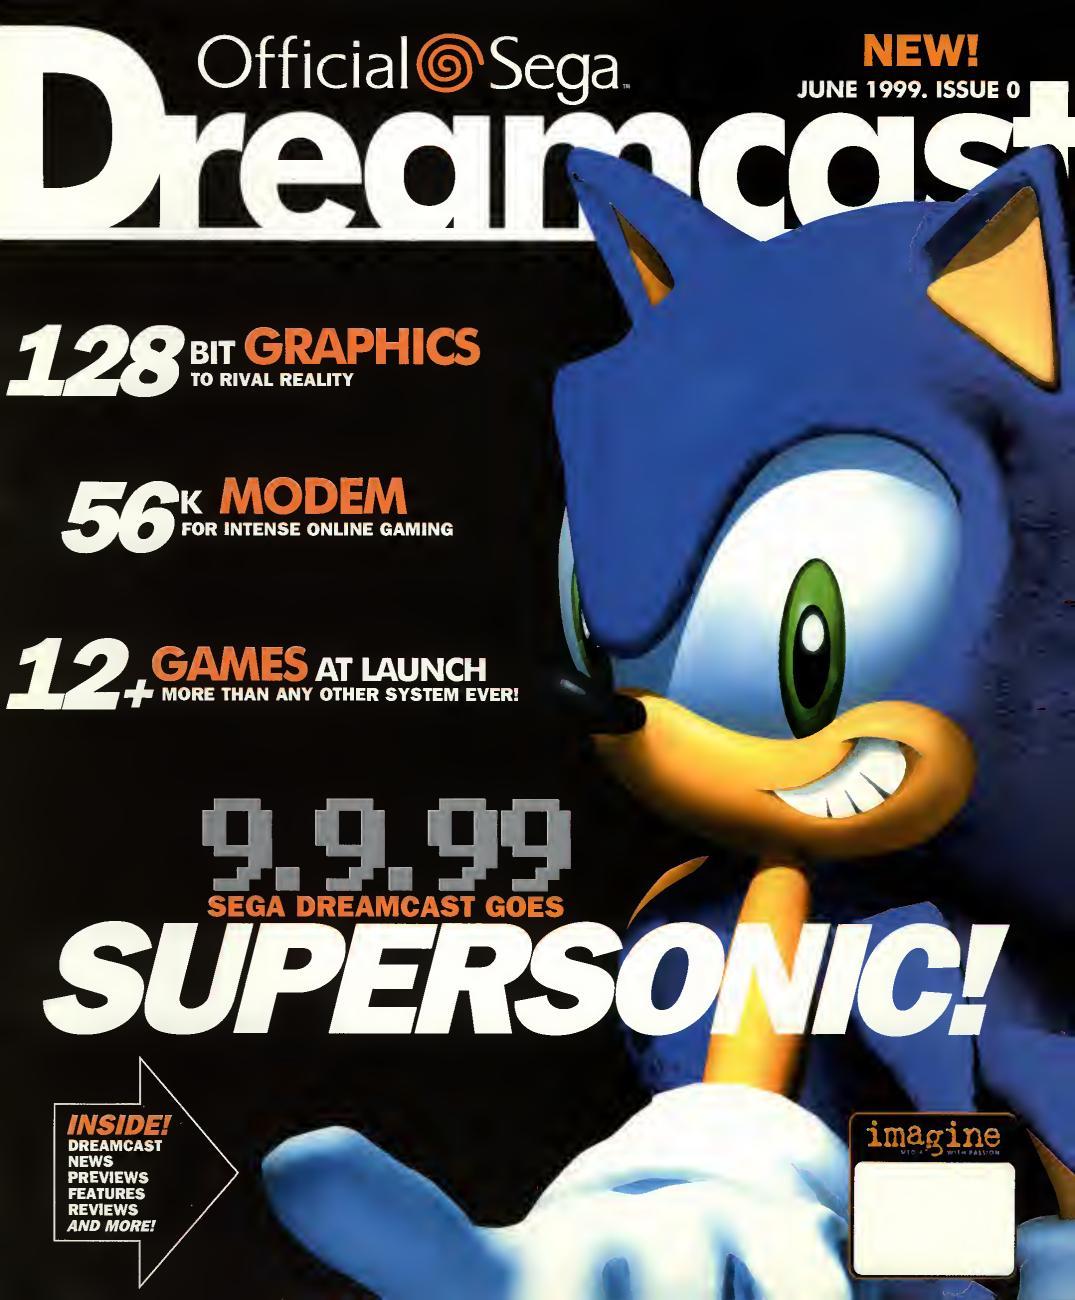 Official Sega Dreamcast 0 Jun 1999 By Willzera Issuu